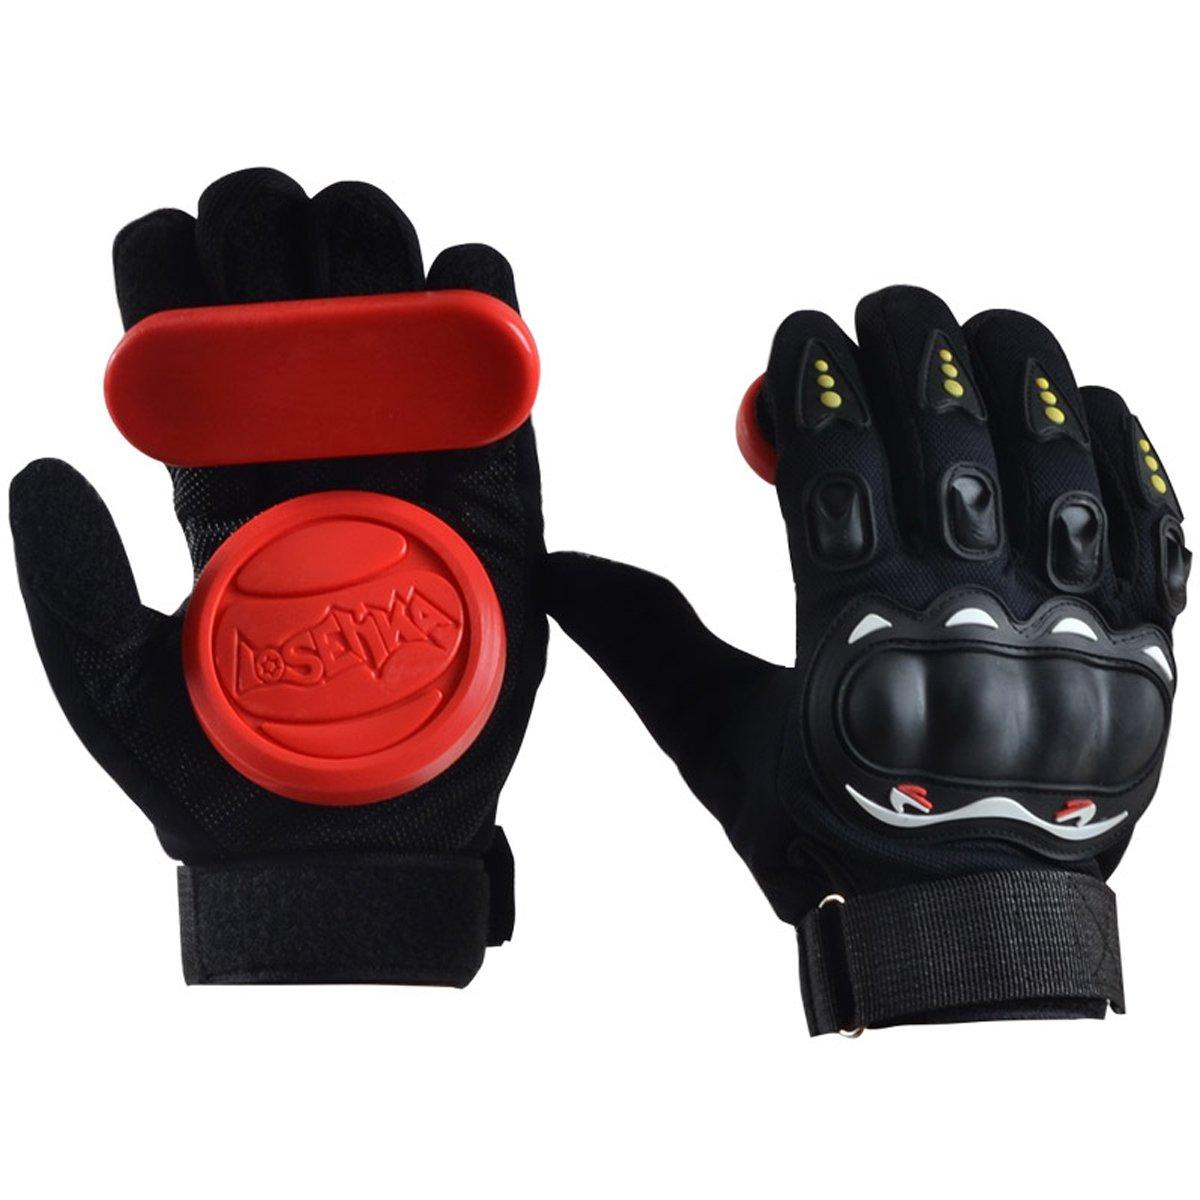 LOSENKA Professional Grip Longboard Skateboard Downhill Sliding Gloves with Slide Blocks Slider Foam Palm Hand Wrist Guards Protector Protective Gear for Skateboarding